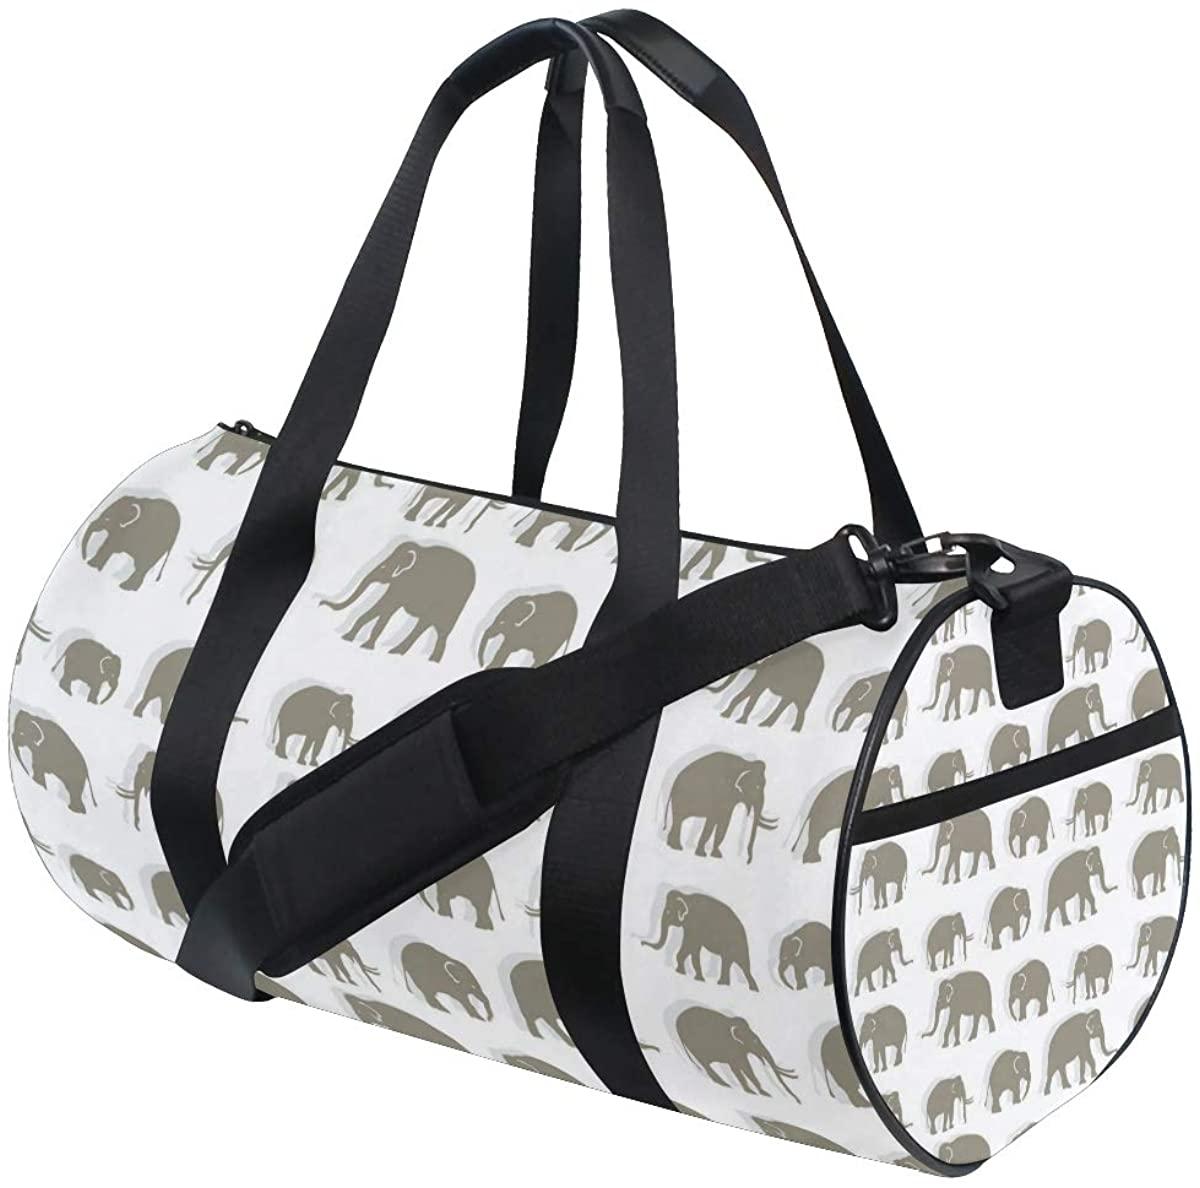 OuLian Gym Bag Cartoon Cute Elephant Women Canvas Duffel Bag Cute Sports Bag for Girls